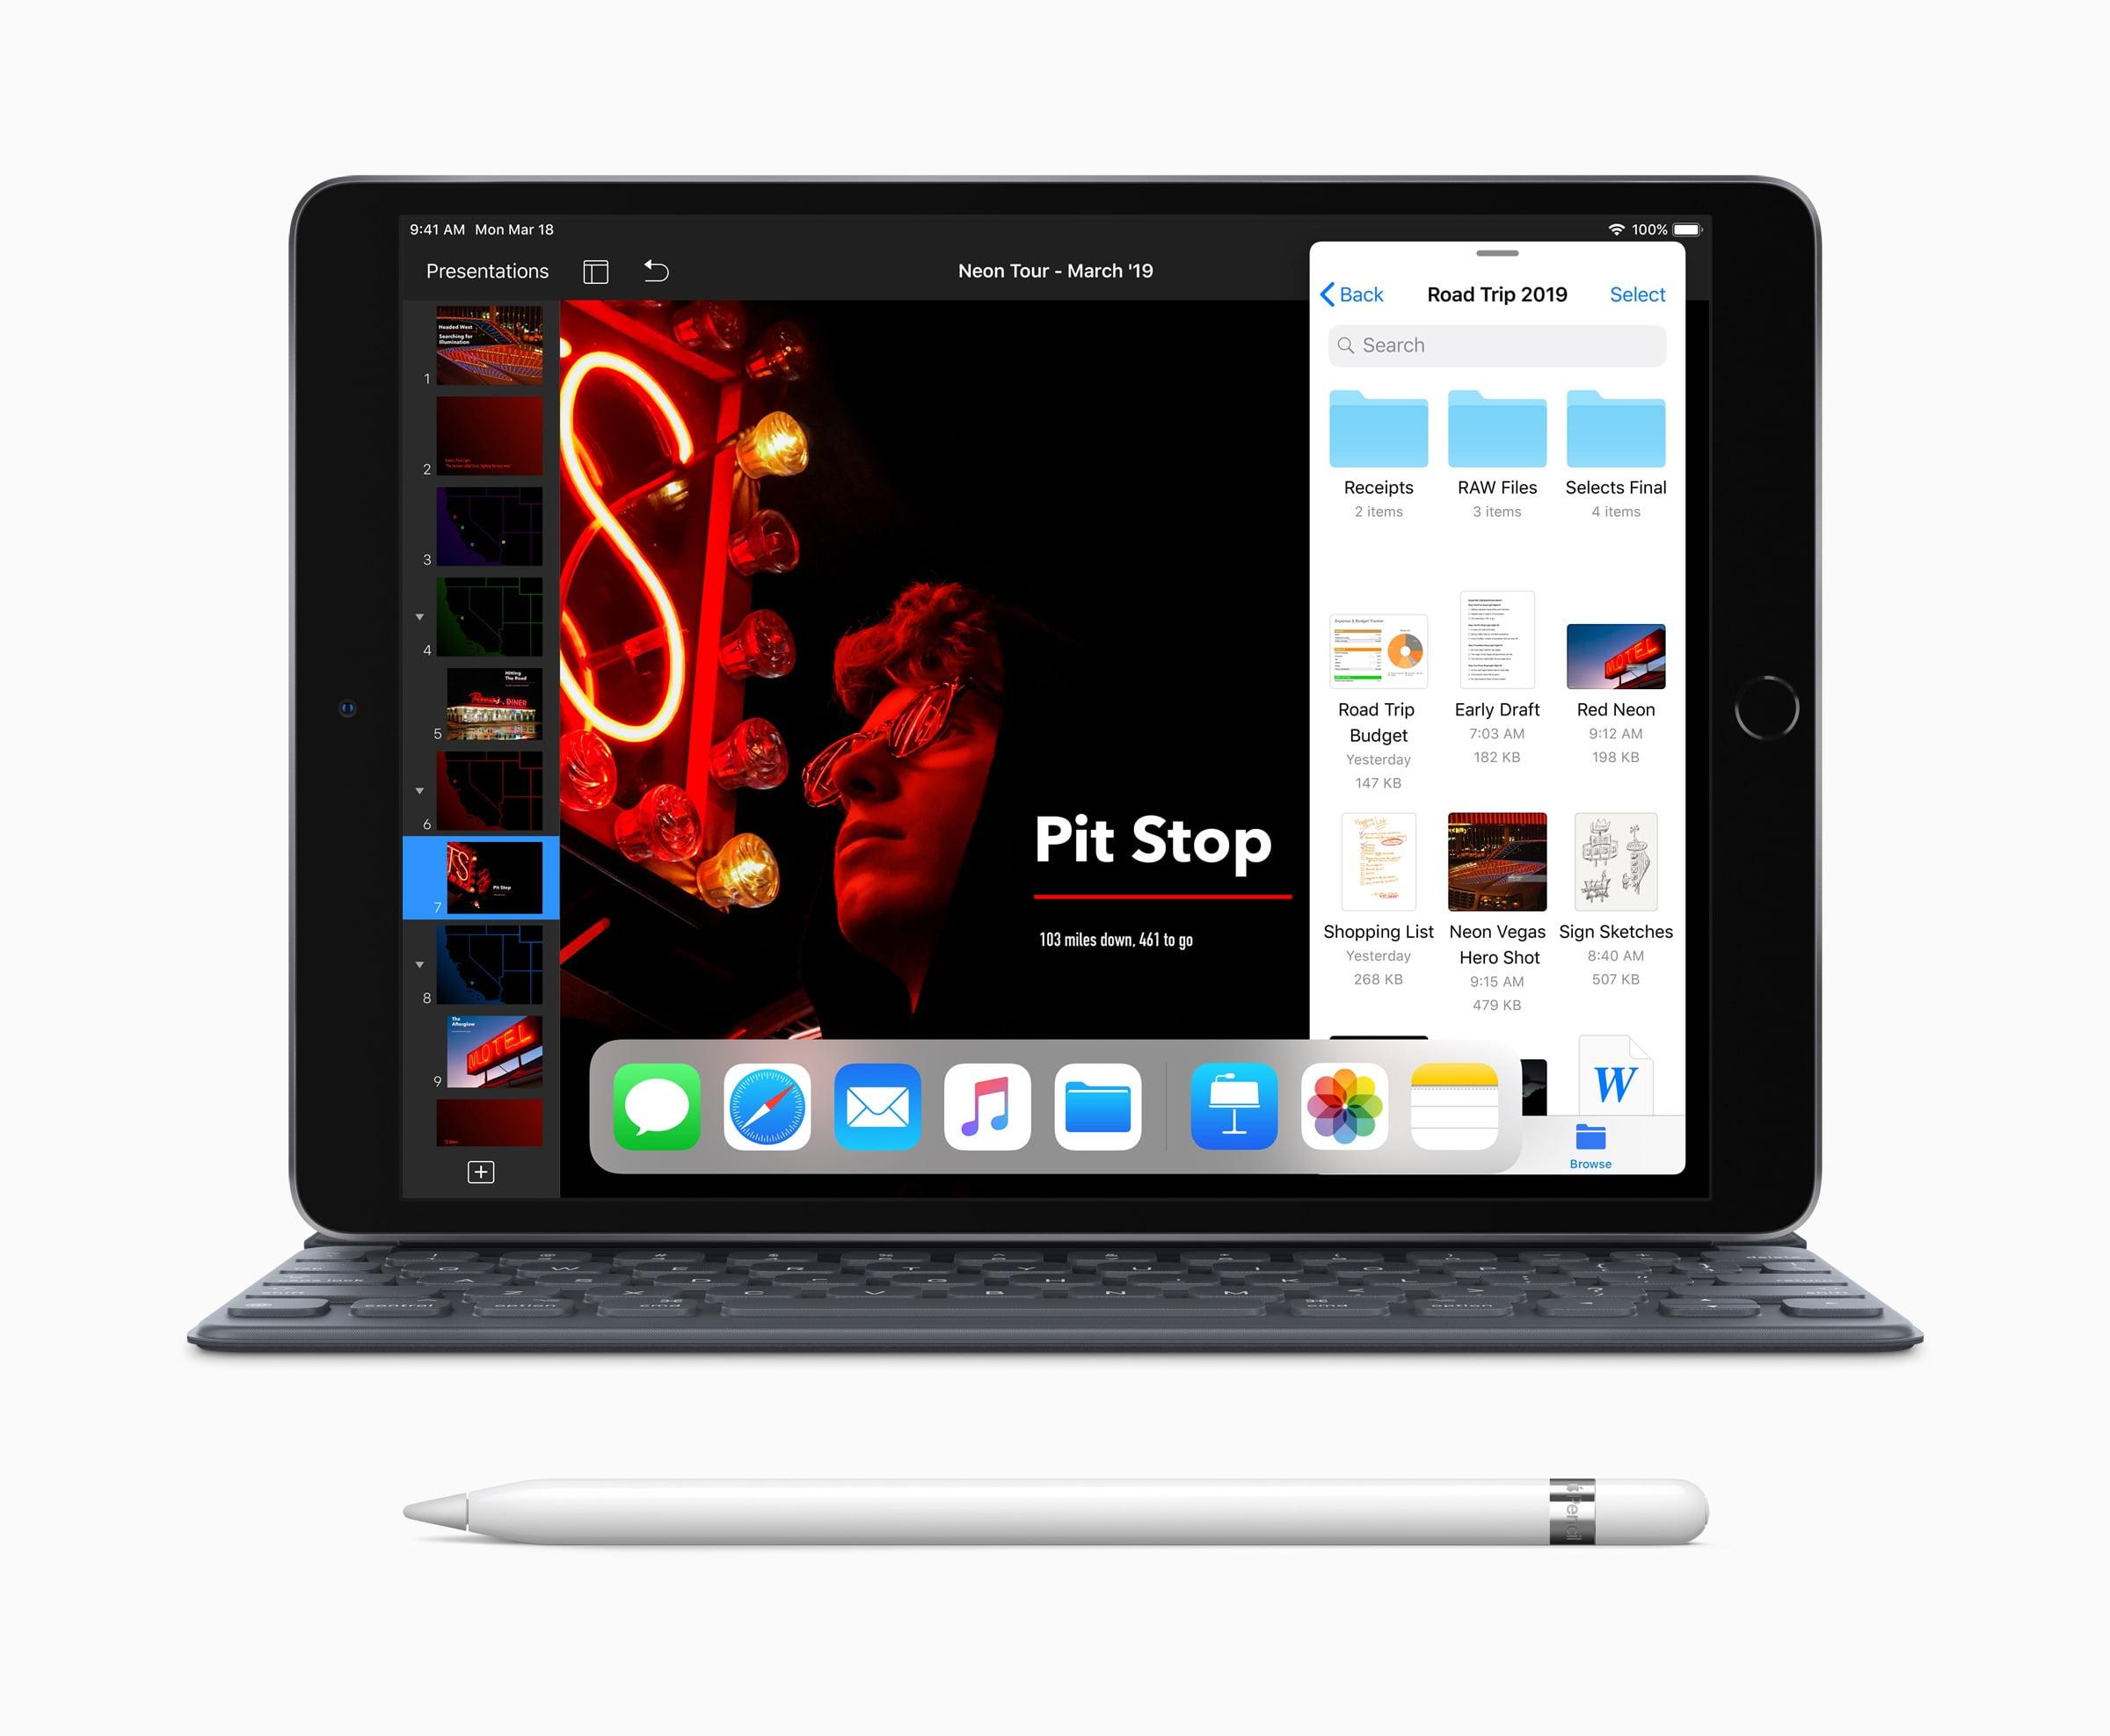 New iPad Air with Smart Keyboard Apple Pencil 03192019